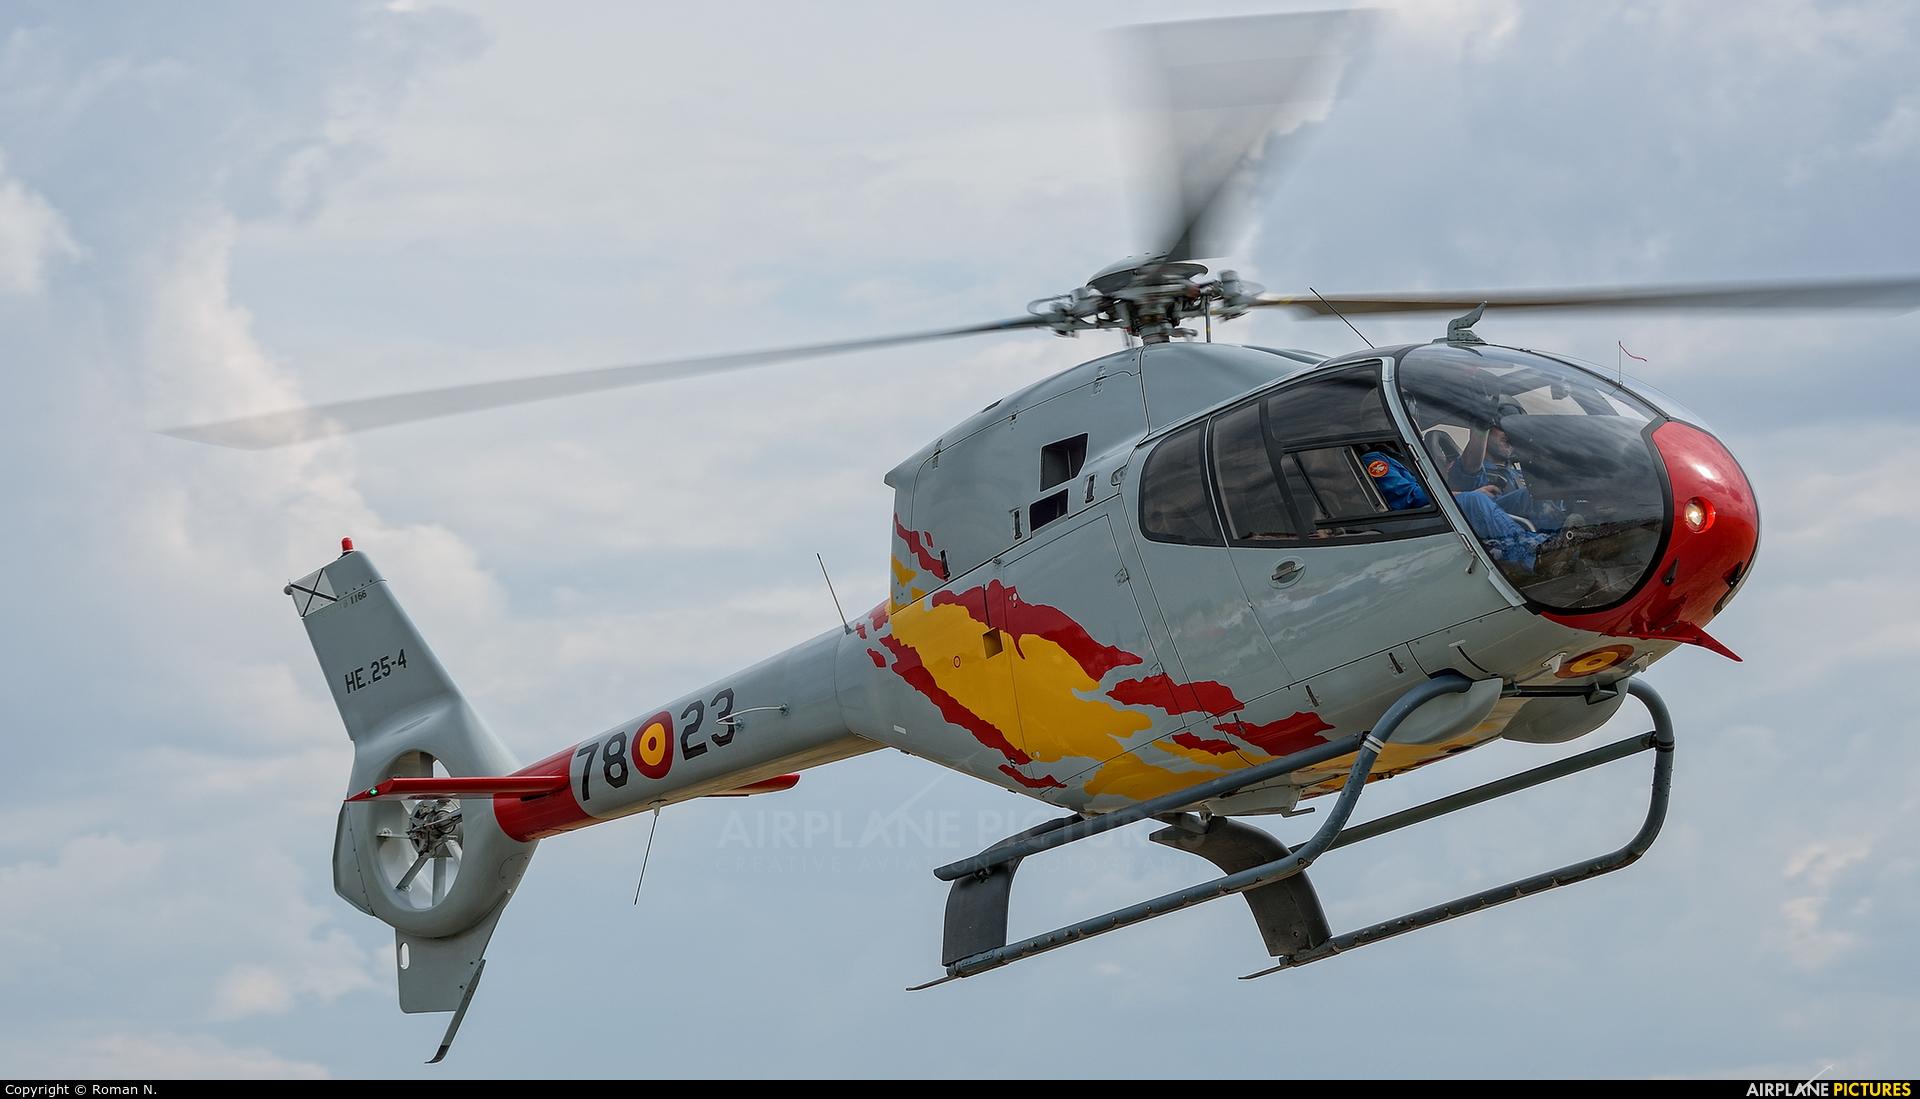 Spain - Air Force: Patrulla ASPA HE.25-4 aircraft at Radom - Sadków